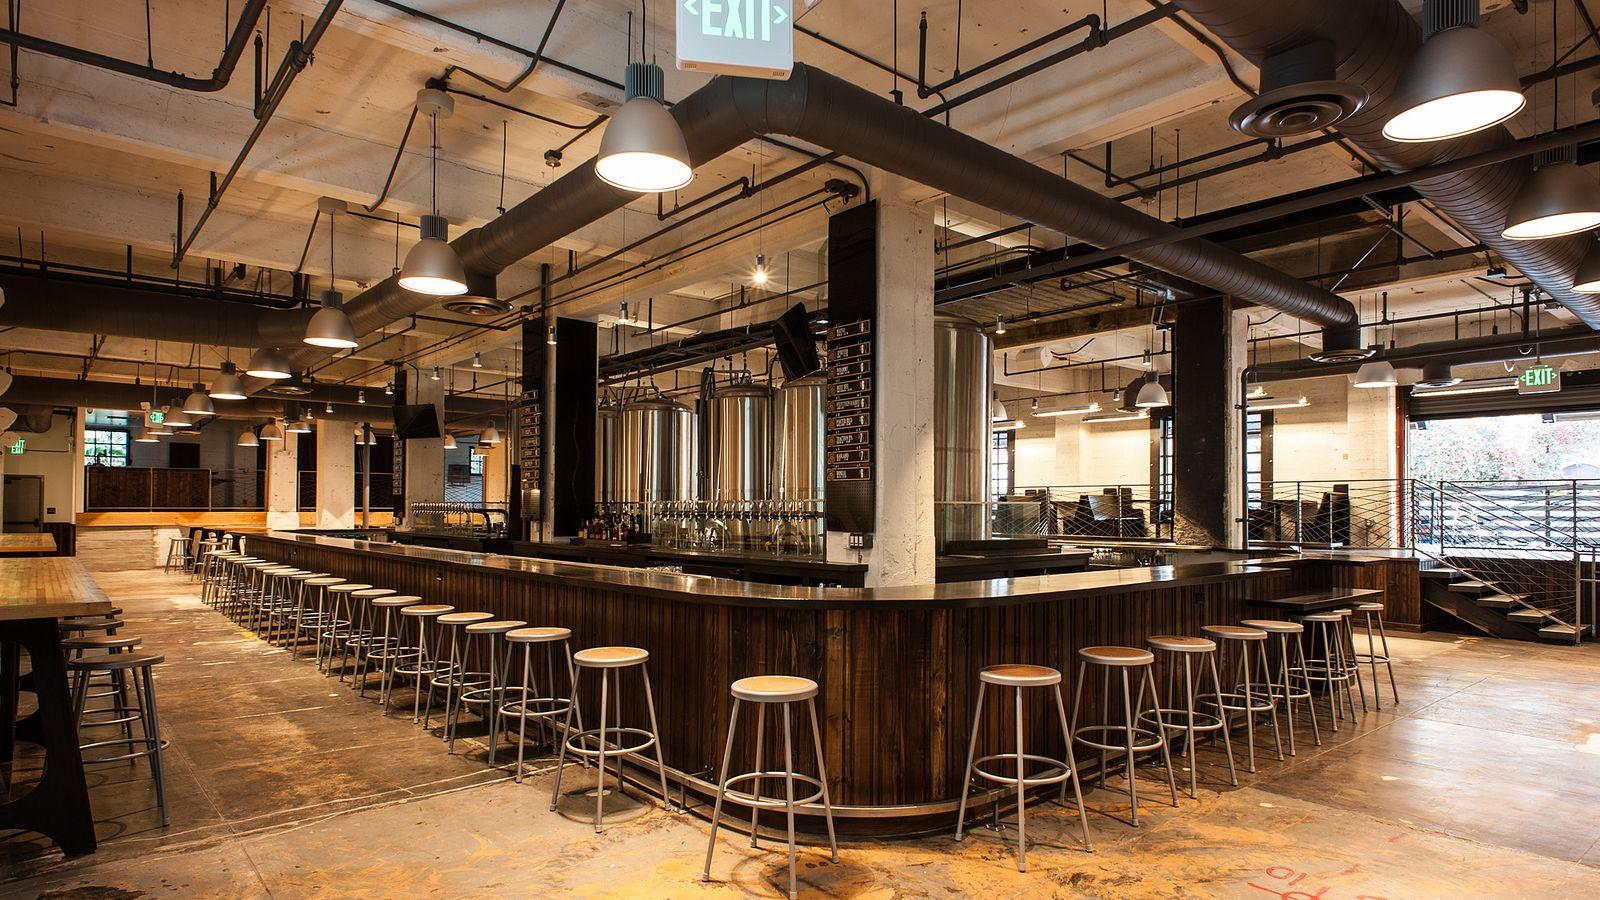 The Best New LA Craft Beer Bars Breweries  Bottle Shops